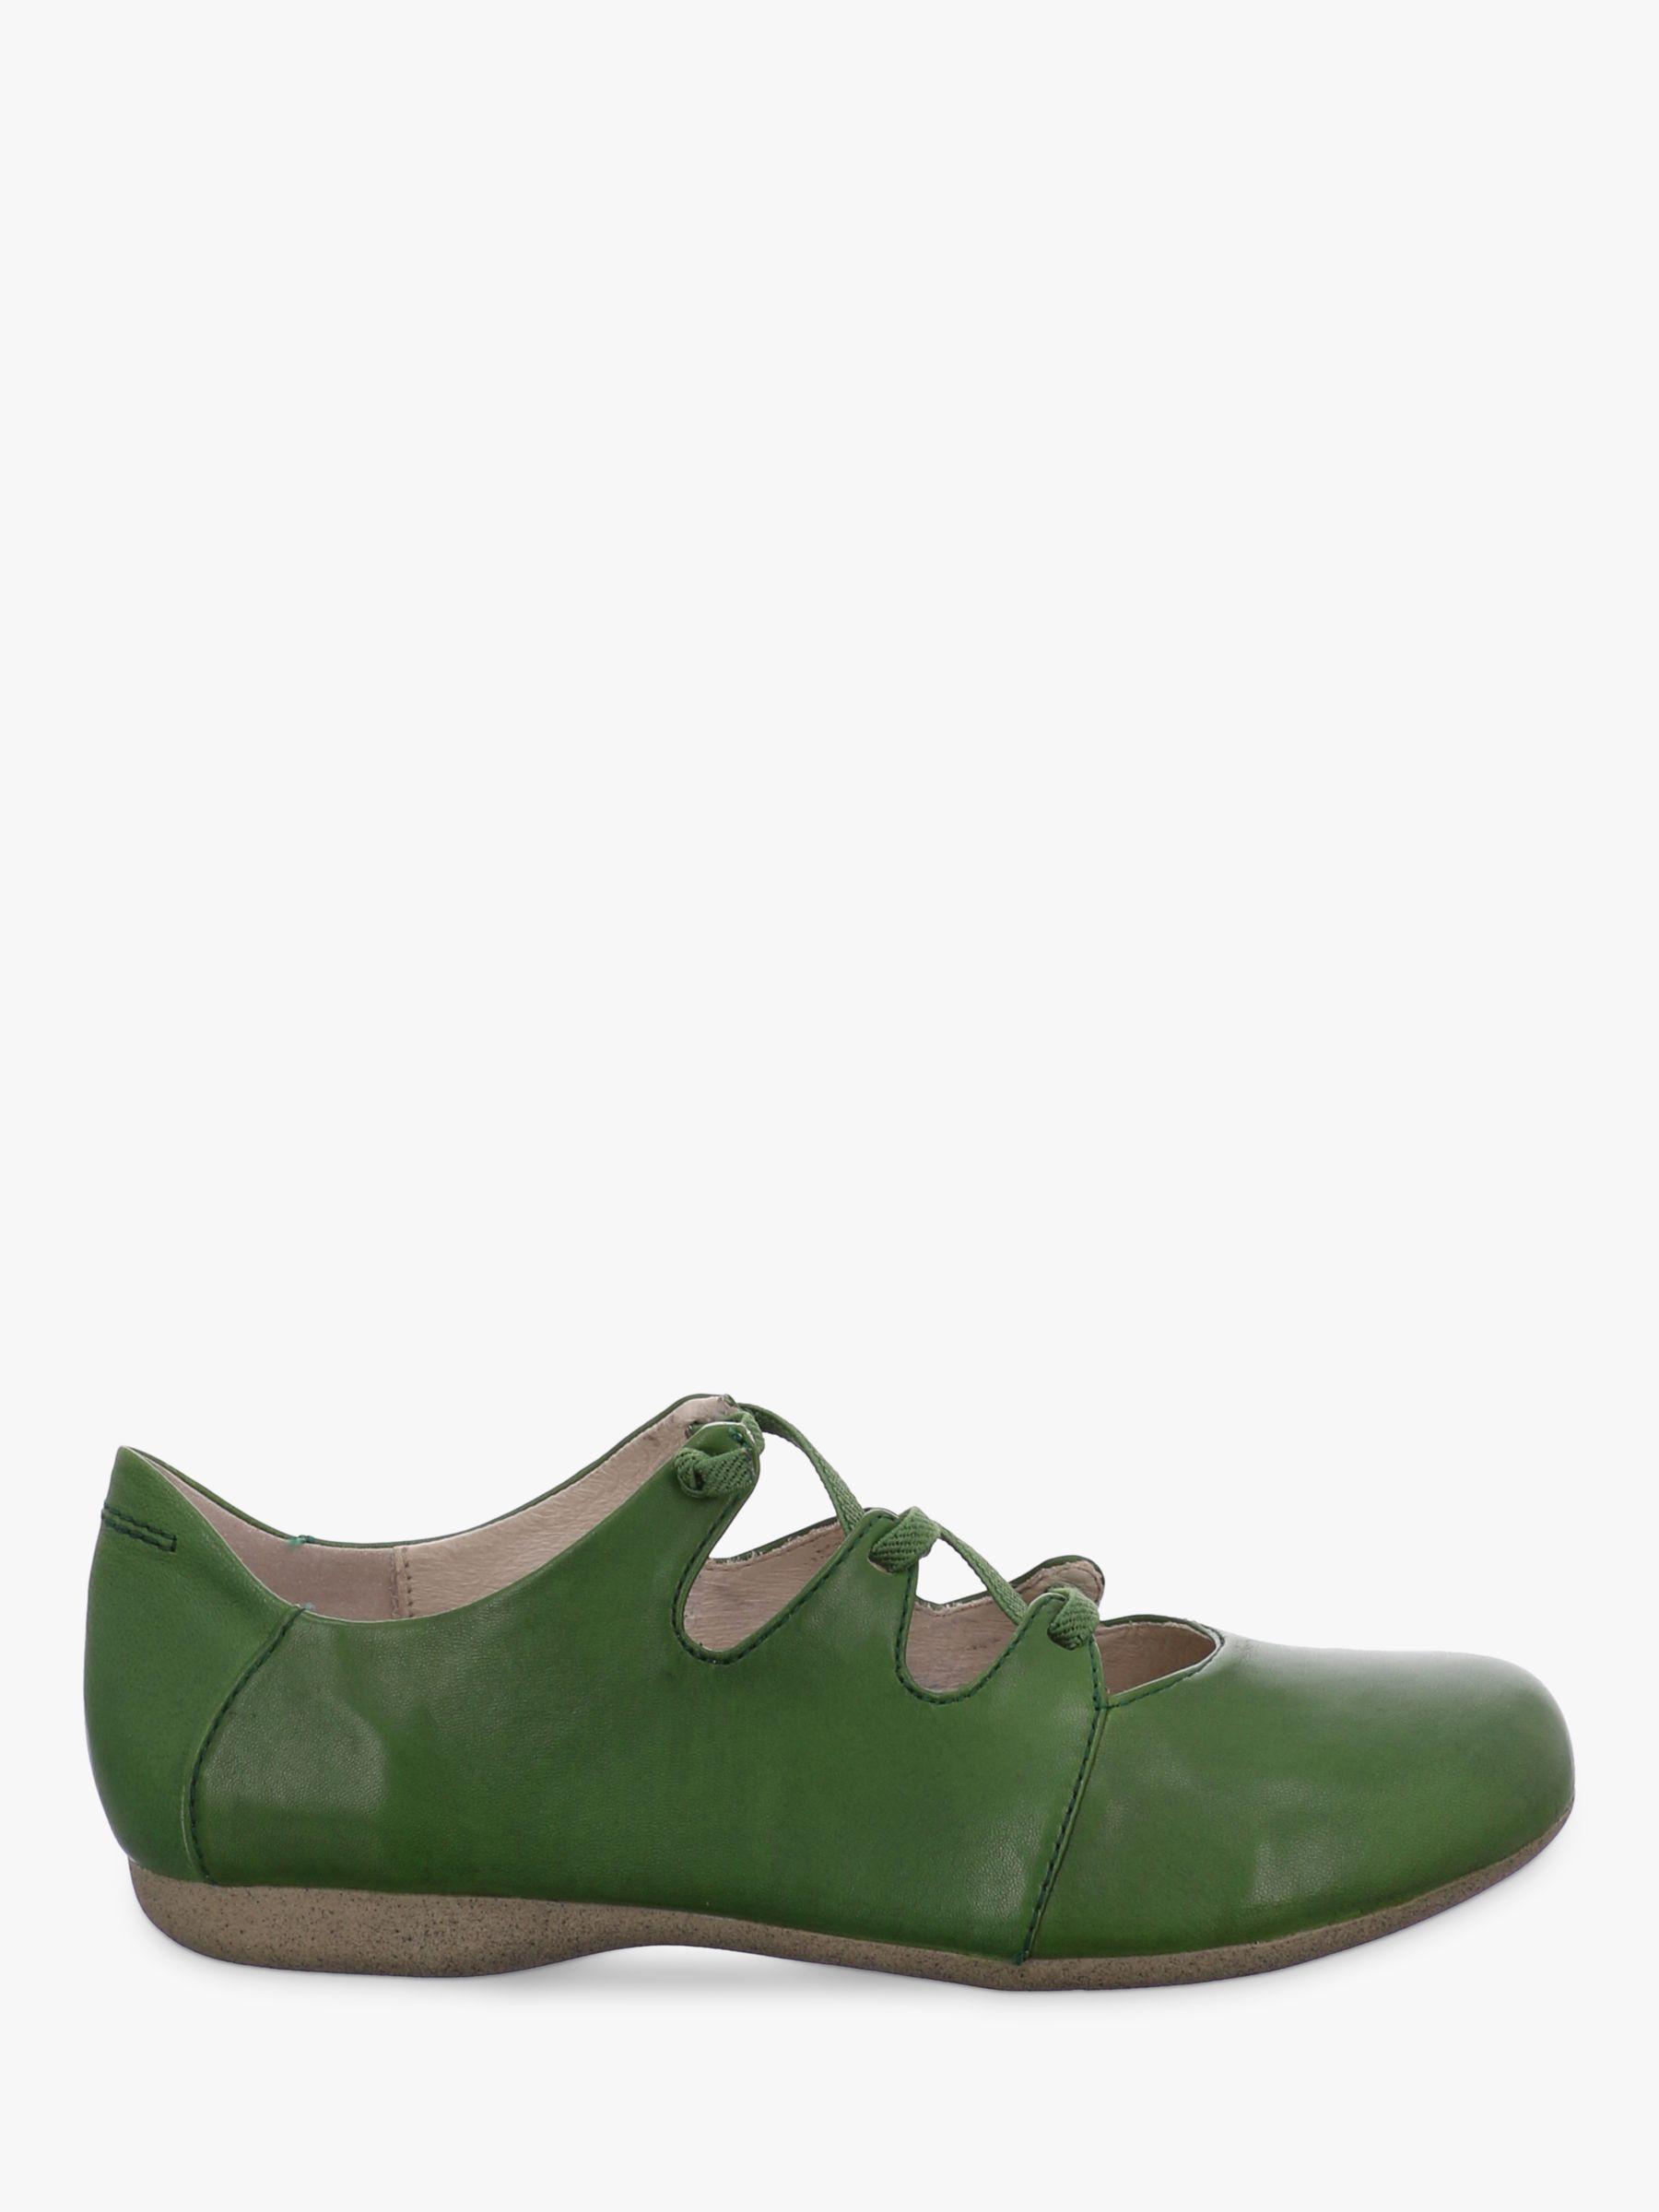 Josef Seibel Josef Seibel Fiona 04 Leather Lace Up Casual Shoes